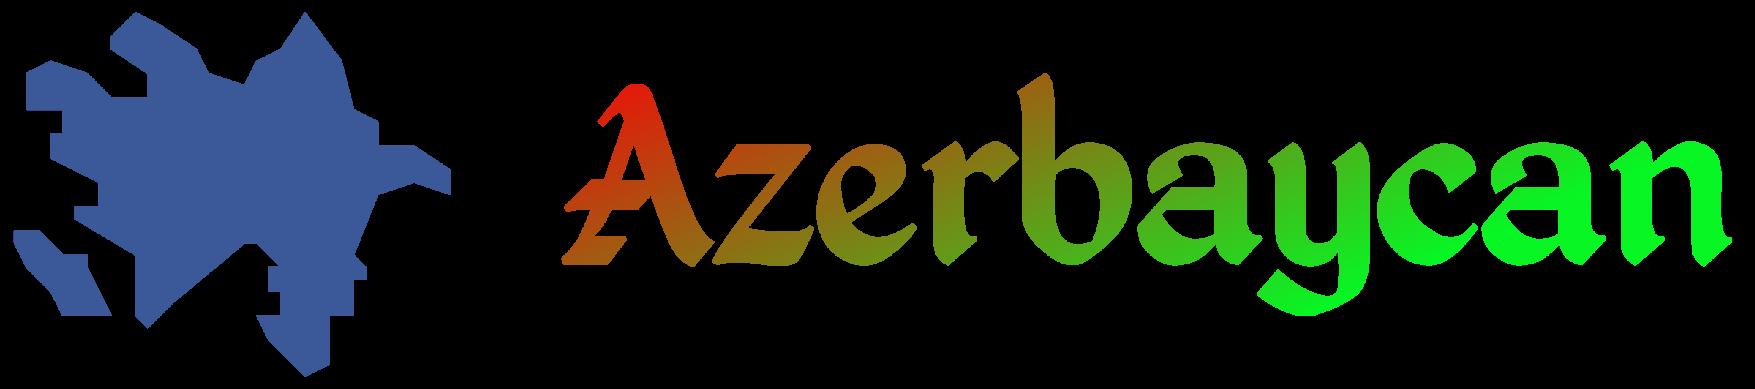 Azerbaycan Bilgi Portalı